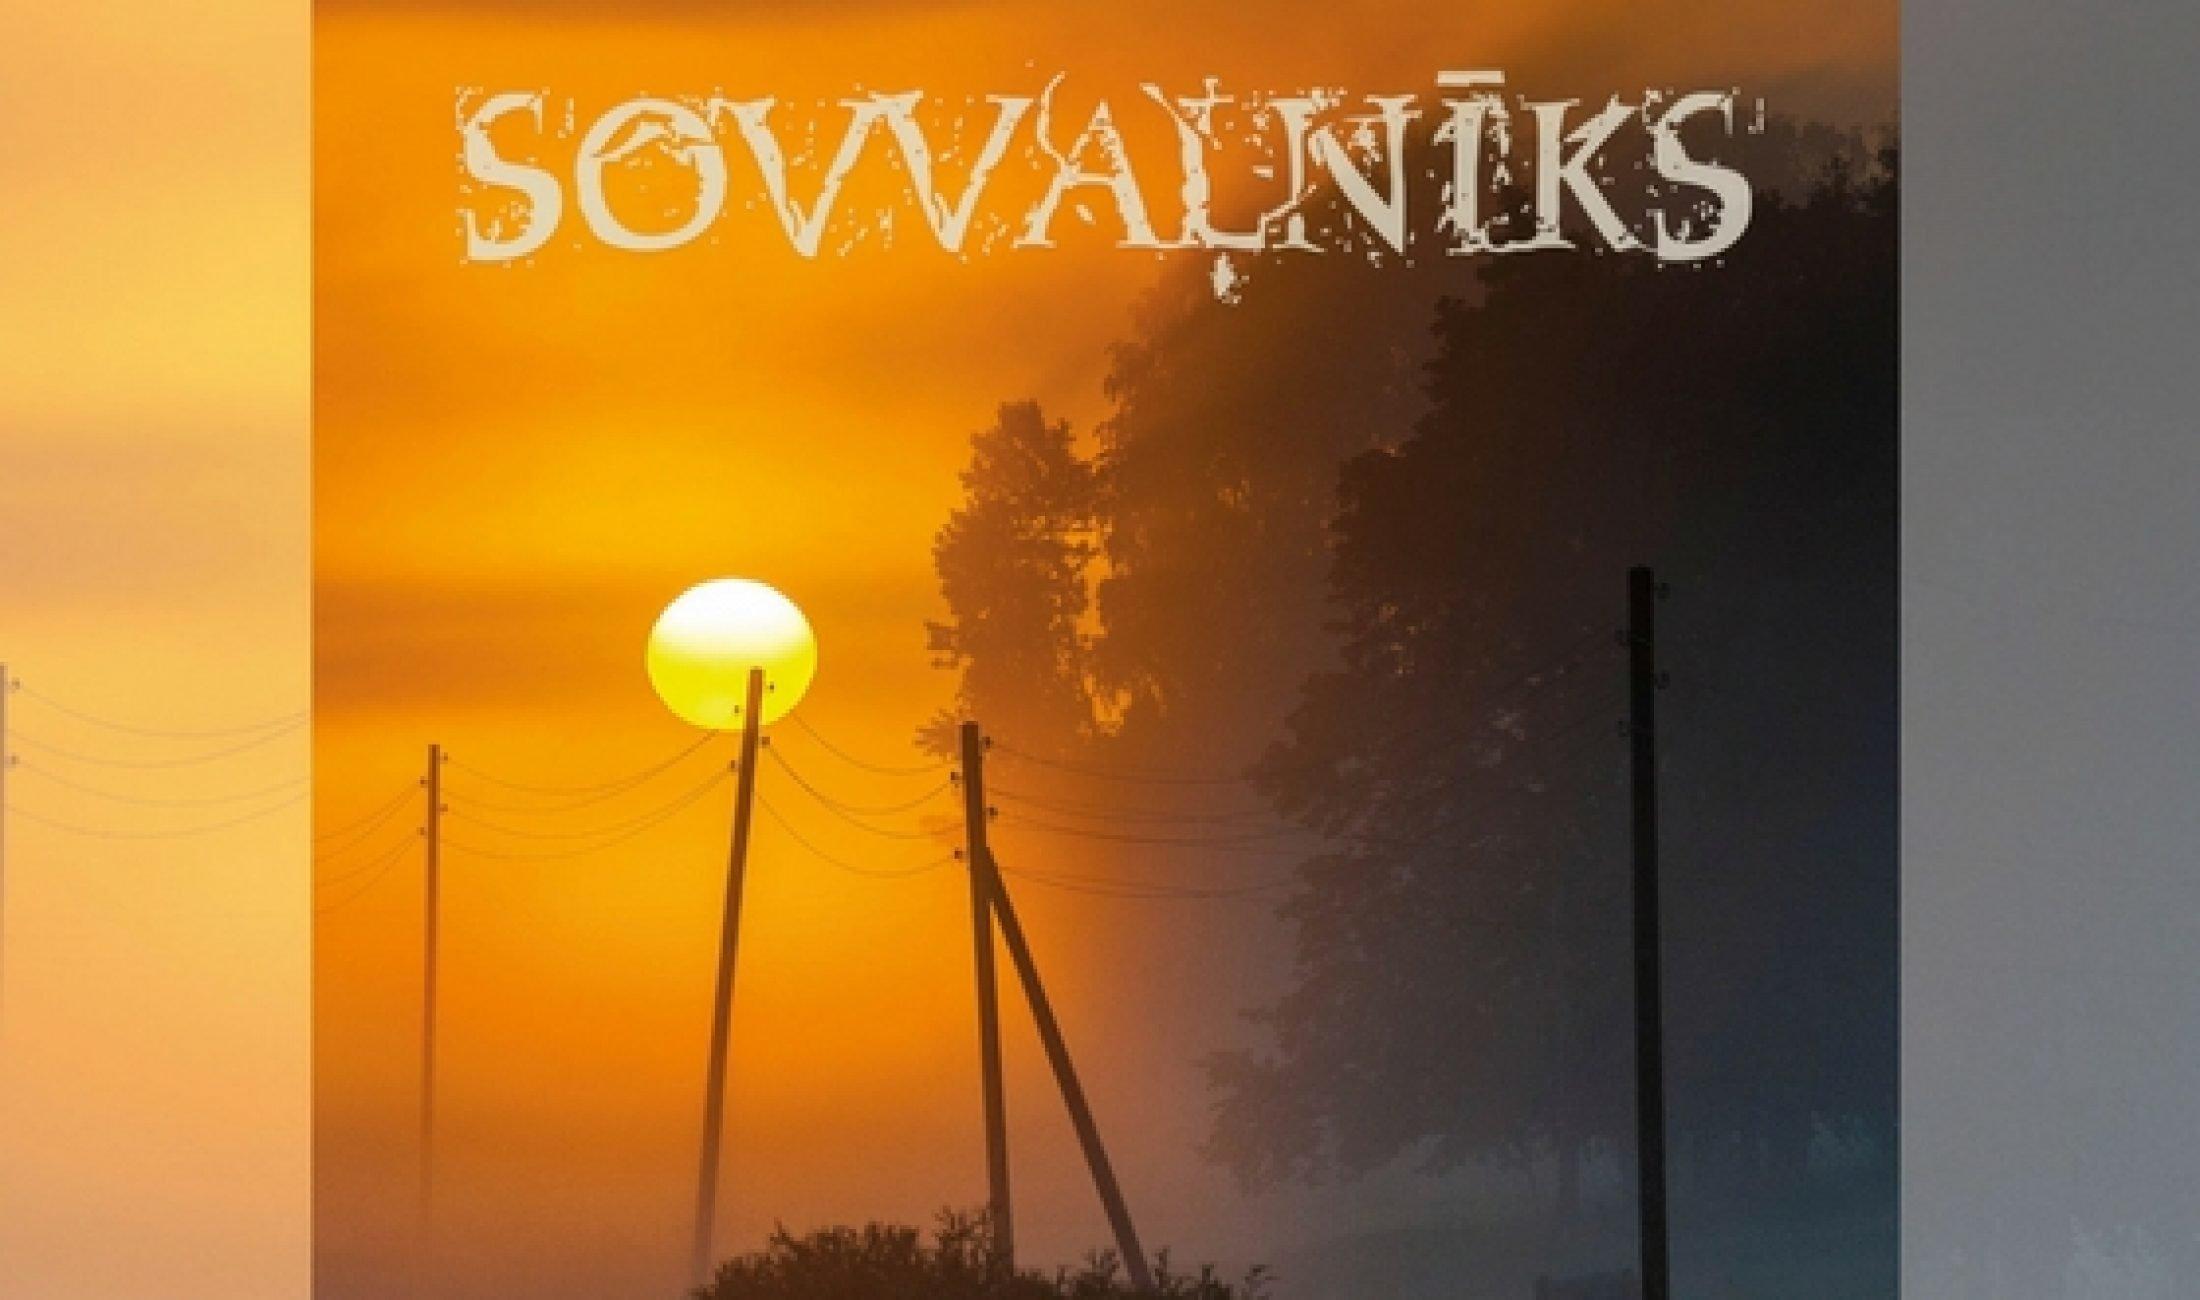 Ceļu pi klauseituoju suoc Sovvaļnīka vinilplate